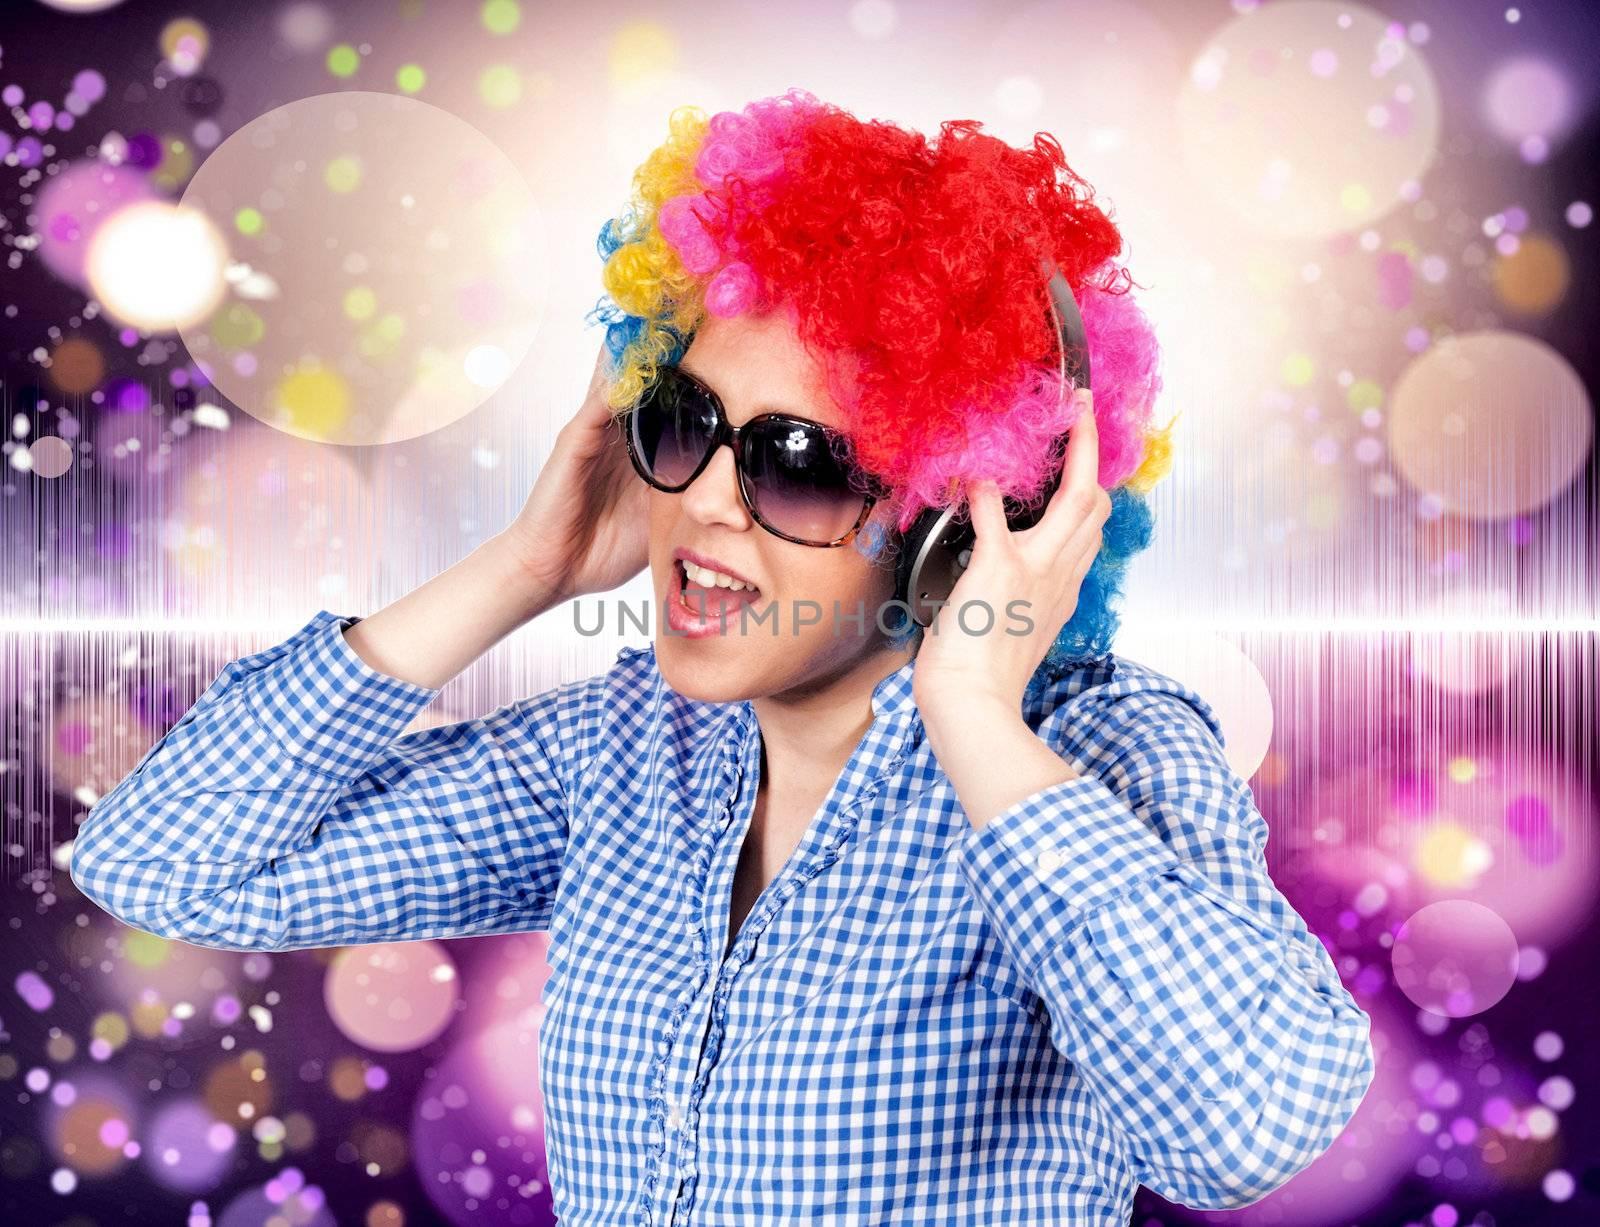 Female with headpjones listening music